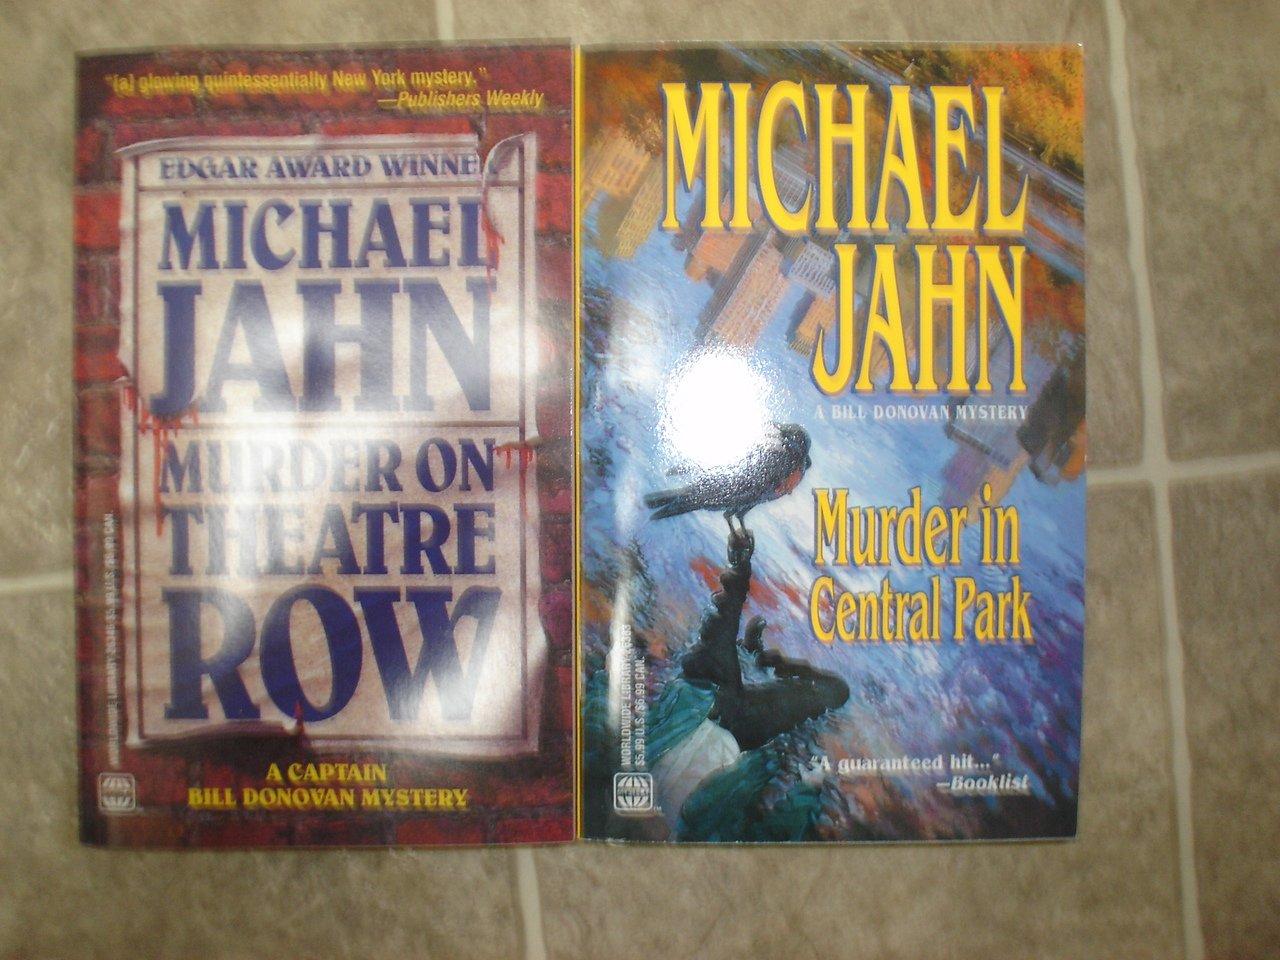 Michael Jahn lot of 2 pb mystery books Bill Donovan New York City